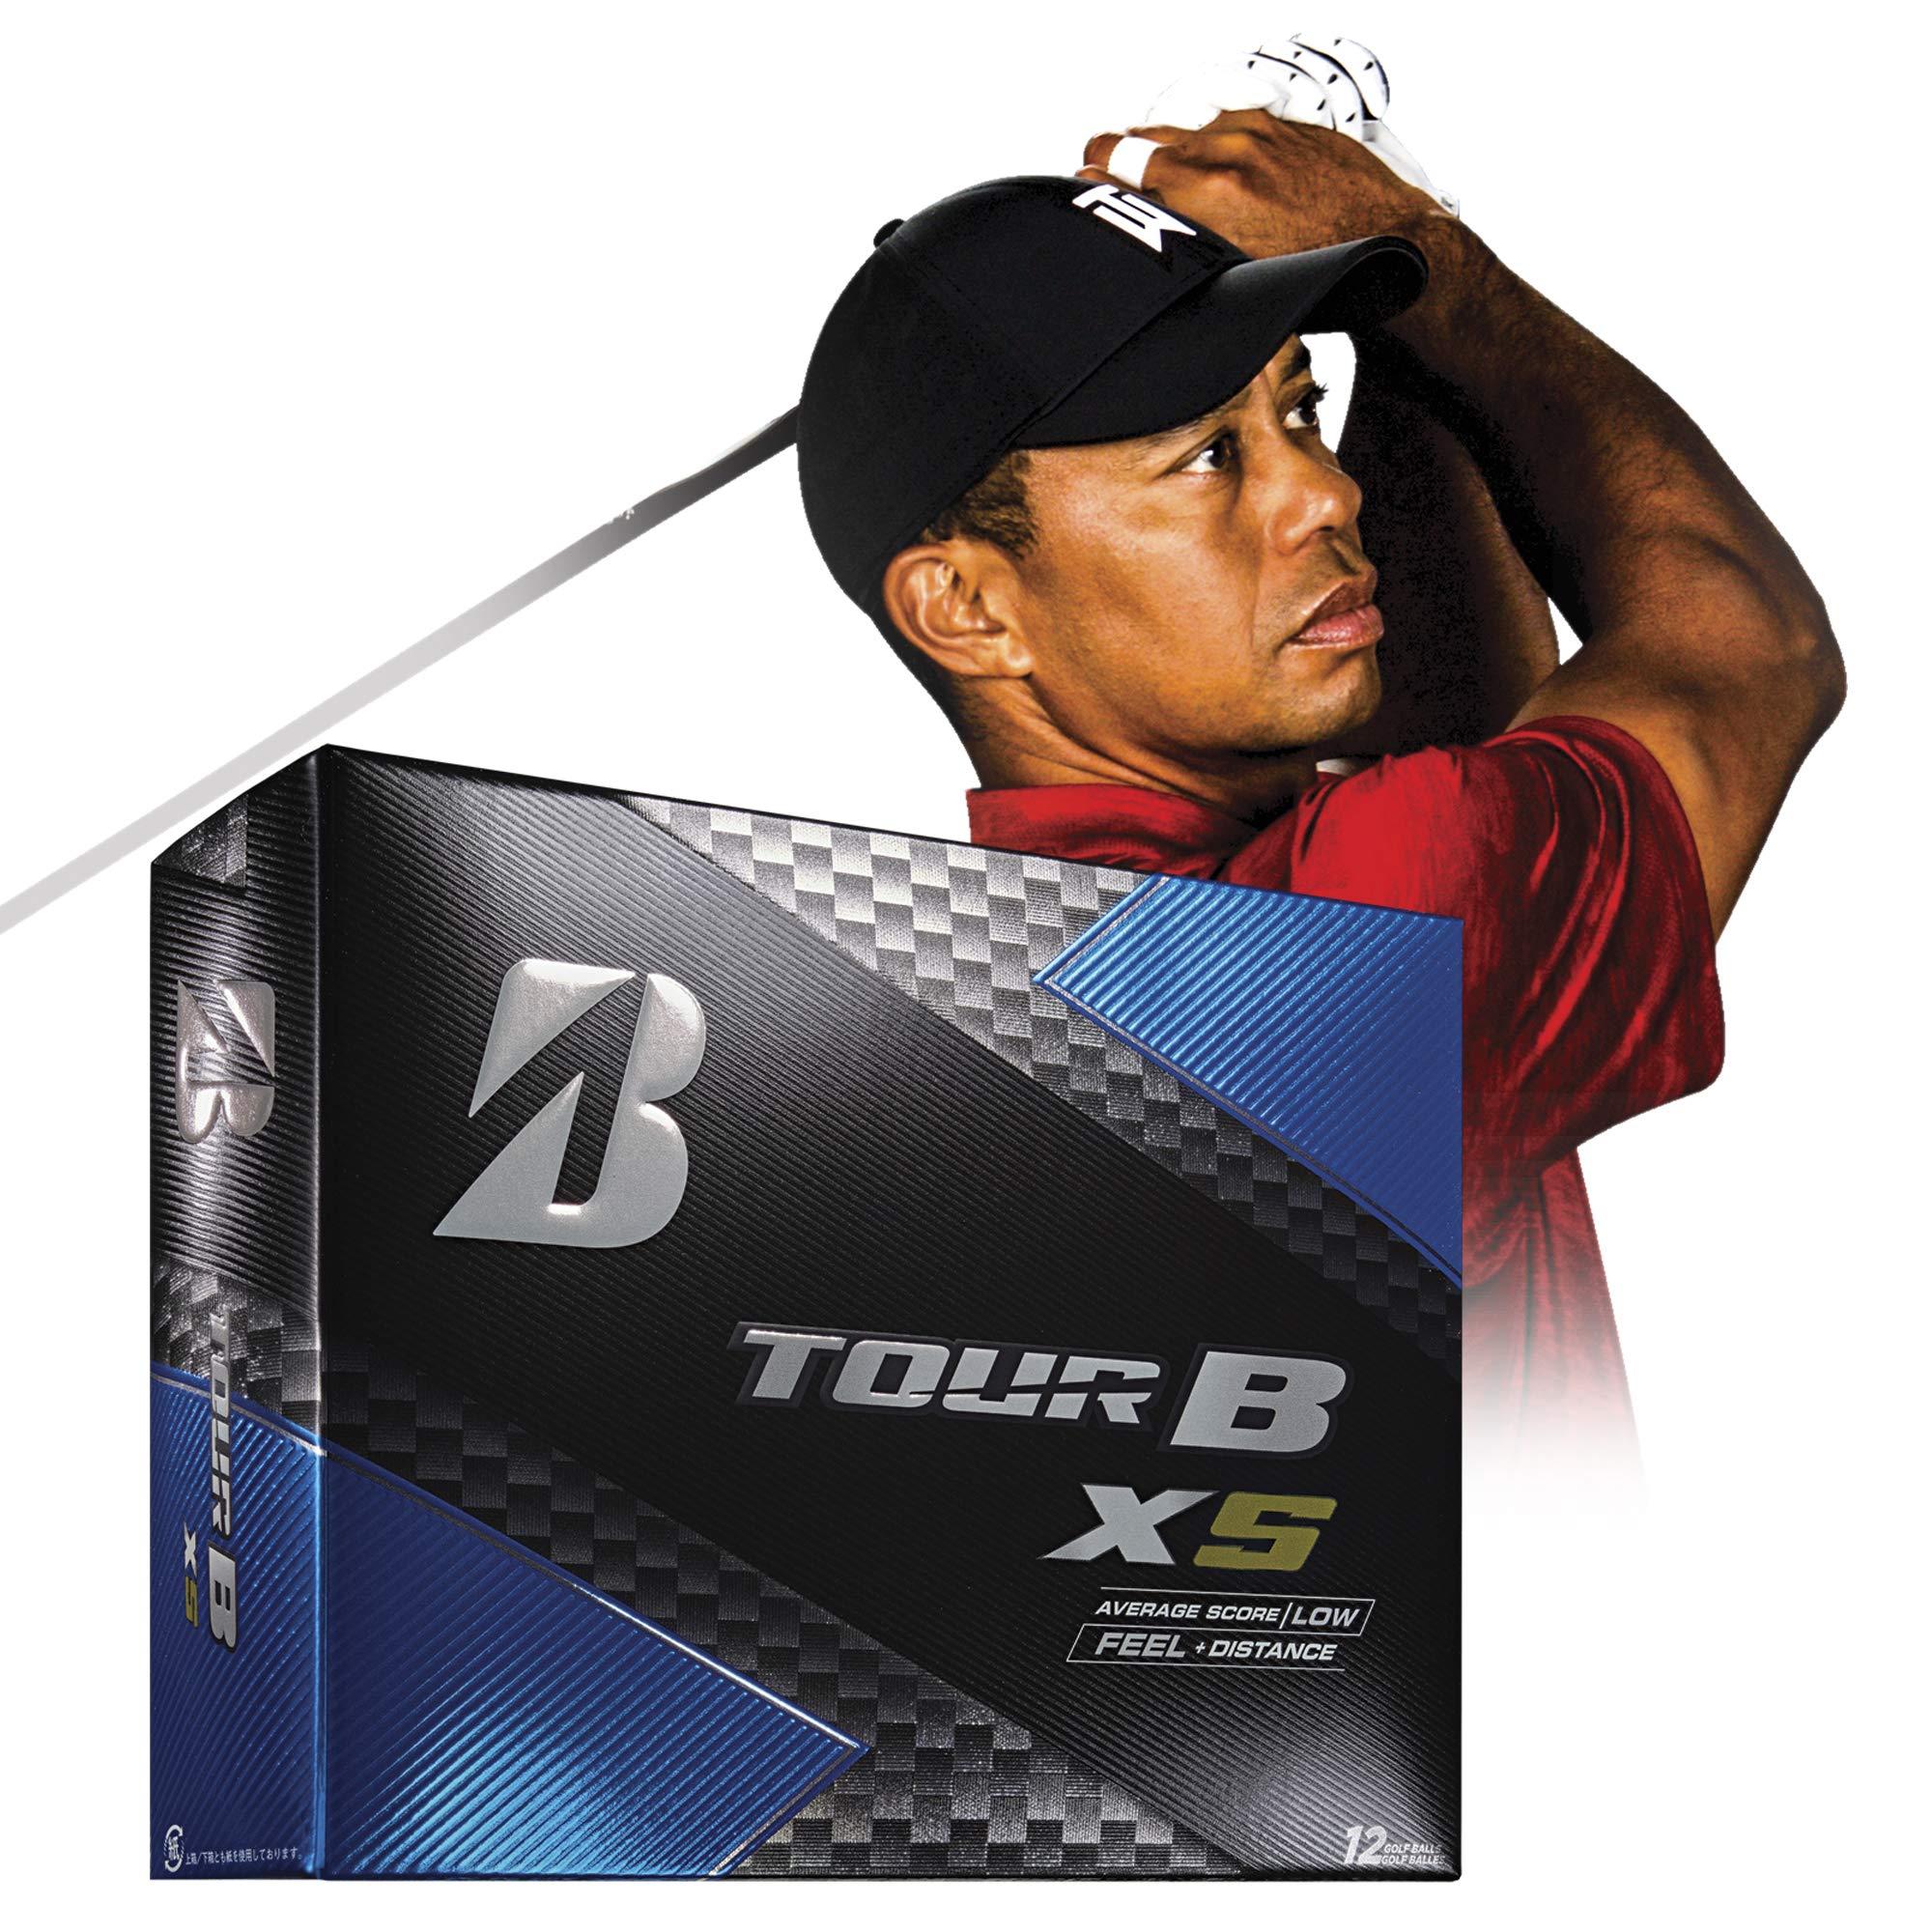 Bridgestone Golf Tour B XS Golf Balls, White  (One Dozen) - 760778083017 by Bridgestone Golf